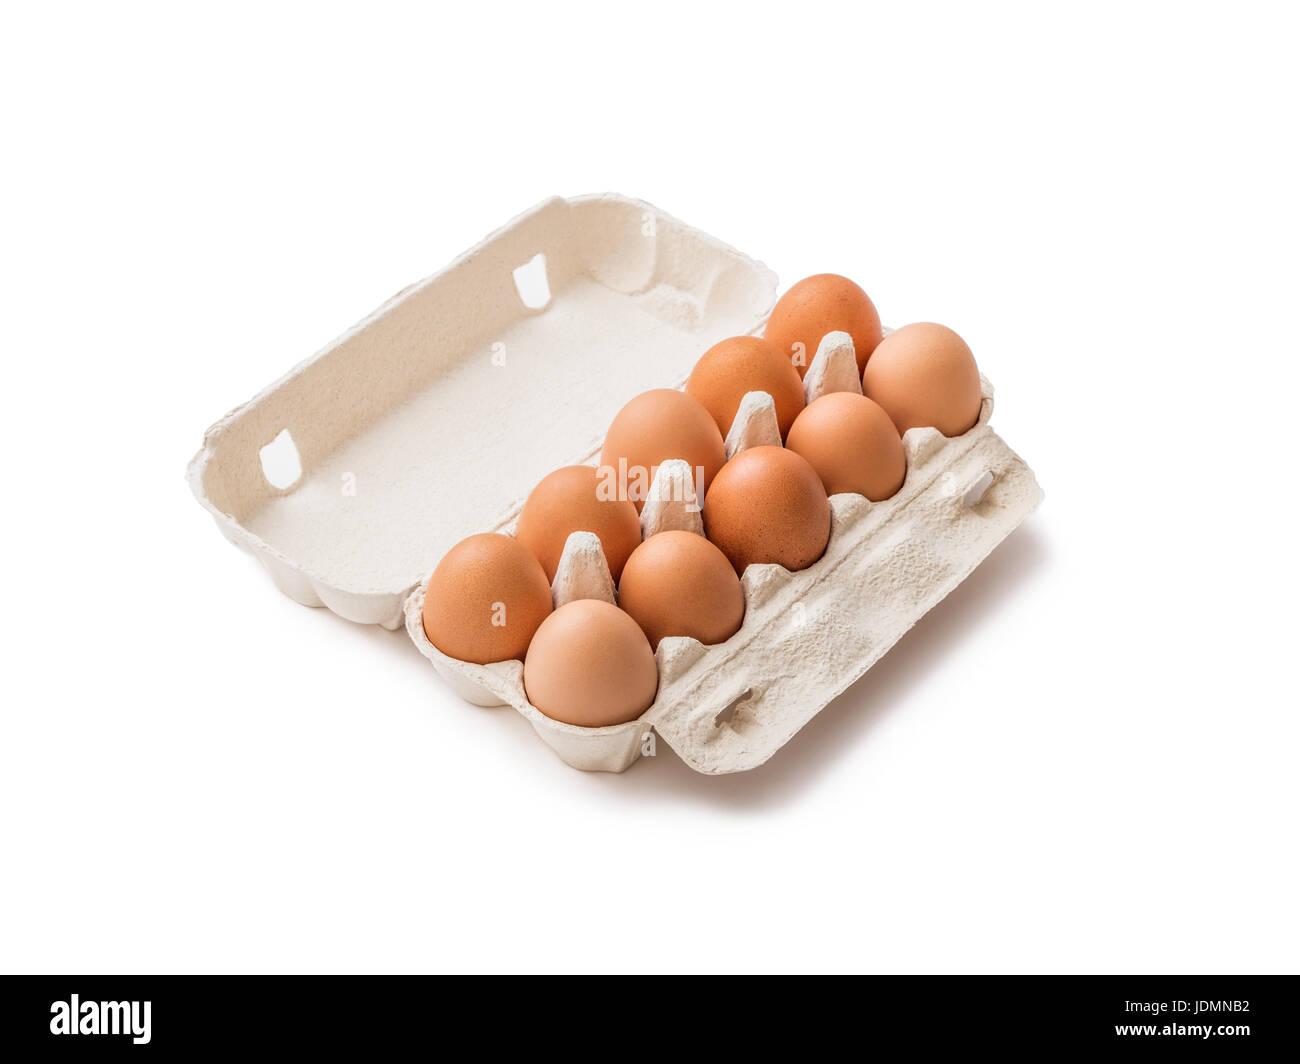 Organic Ten Egg Pack Isolated on White - Stock Image